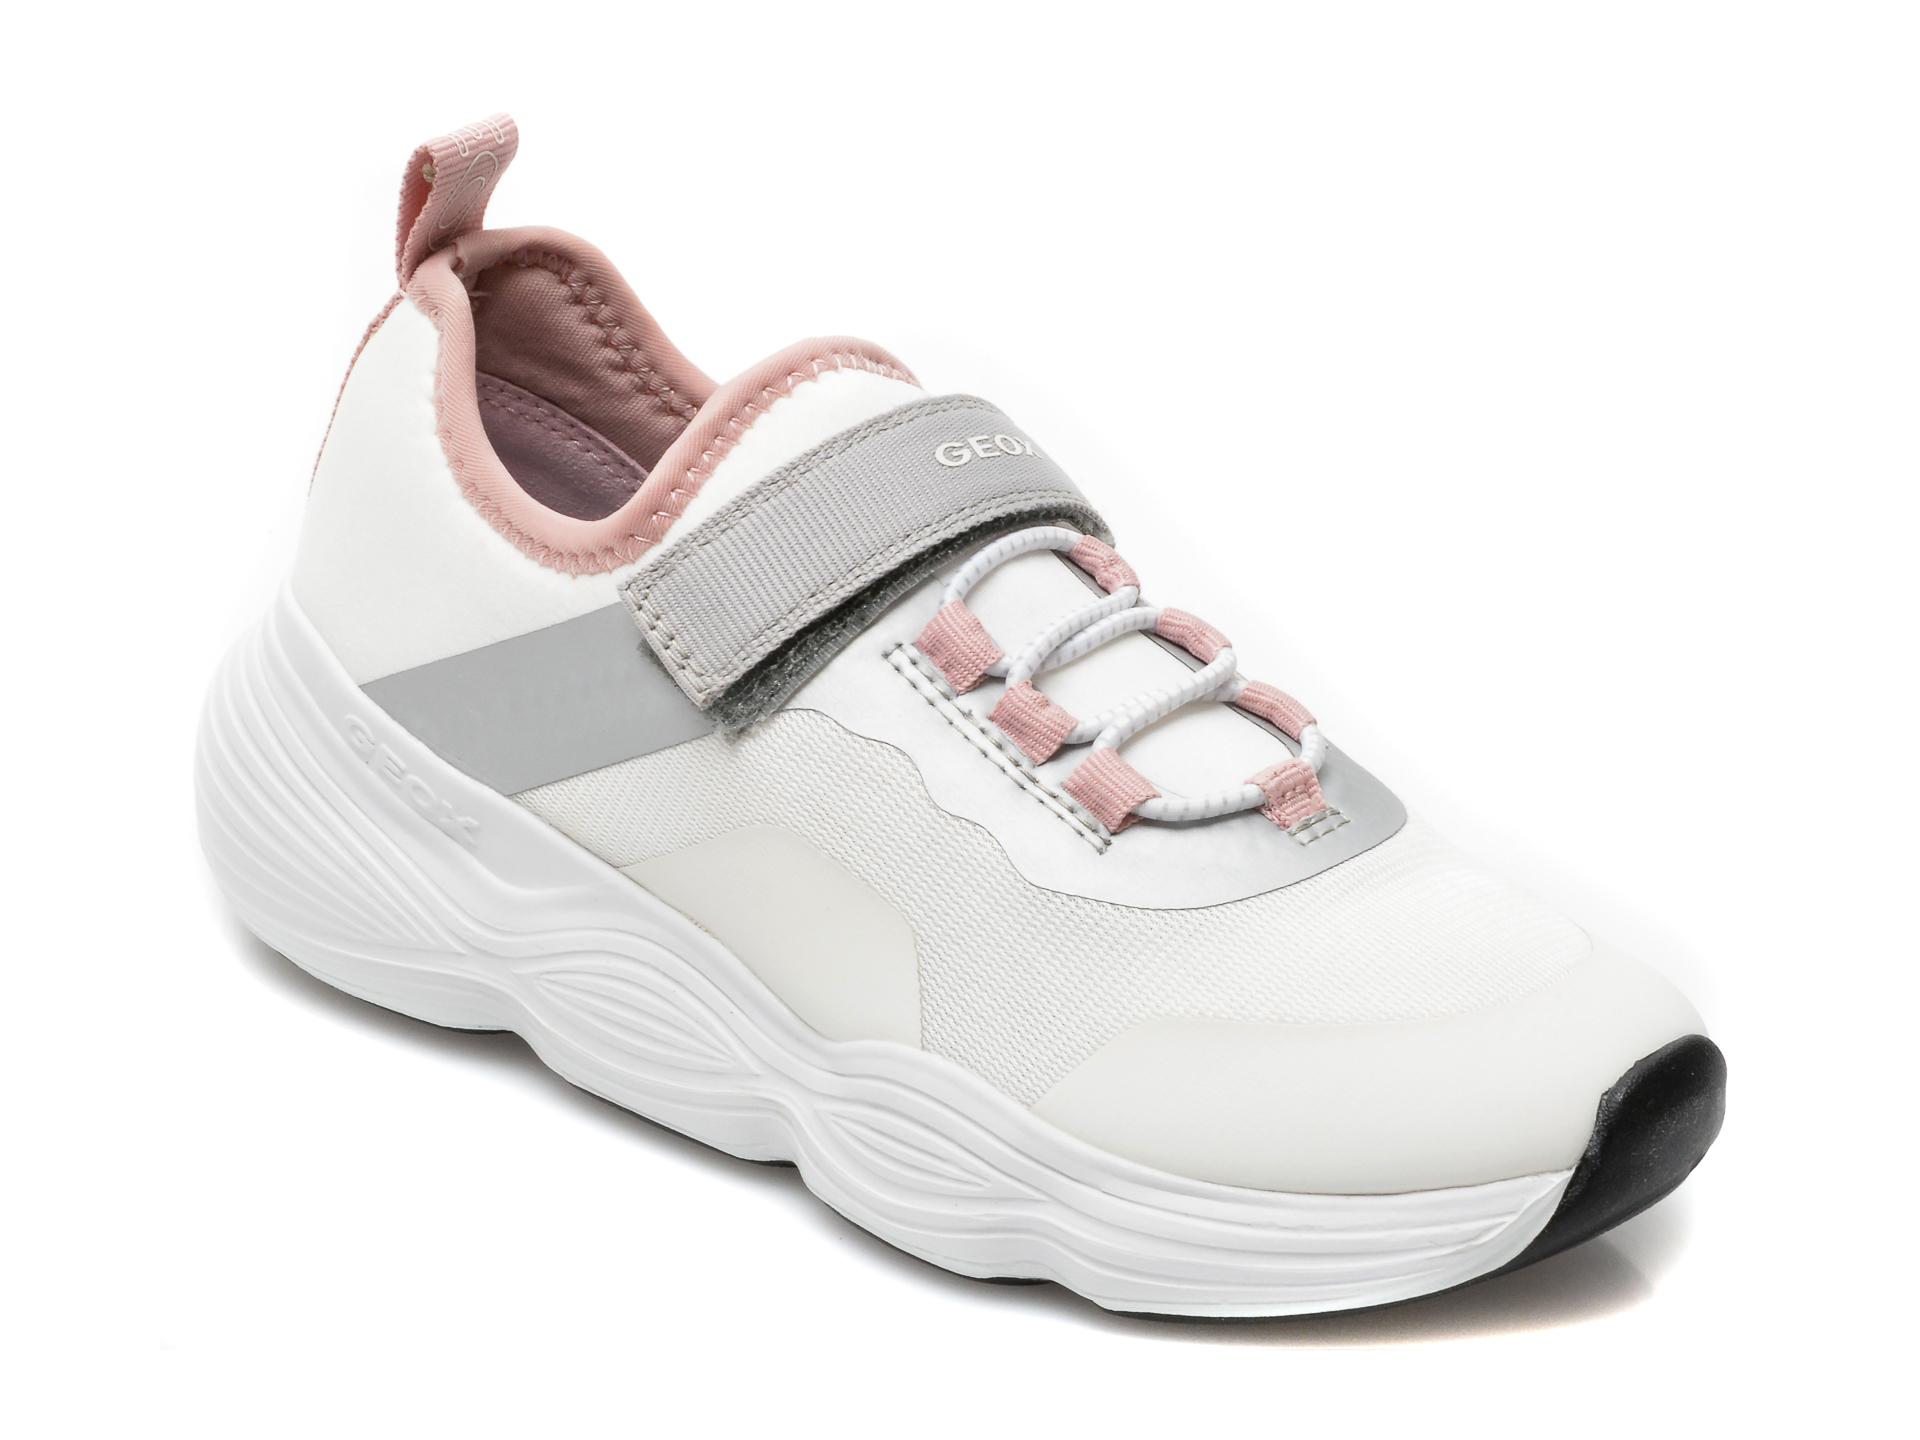 Pantofi sport GEOX albi, J15CNA, din material textil